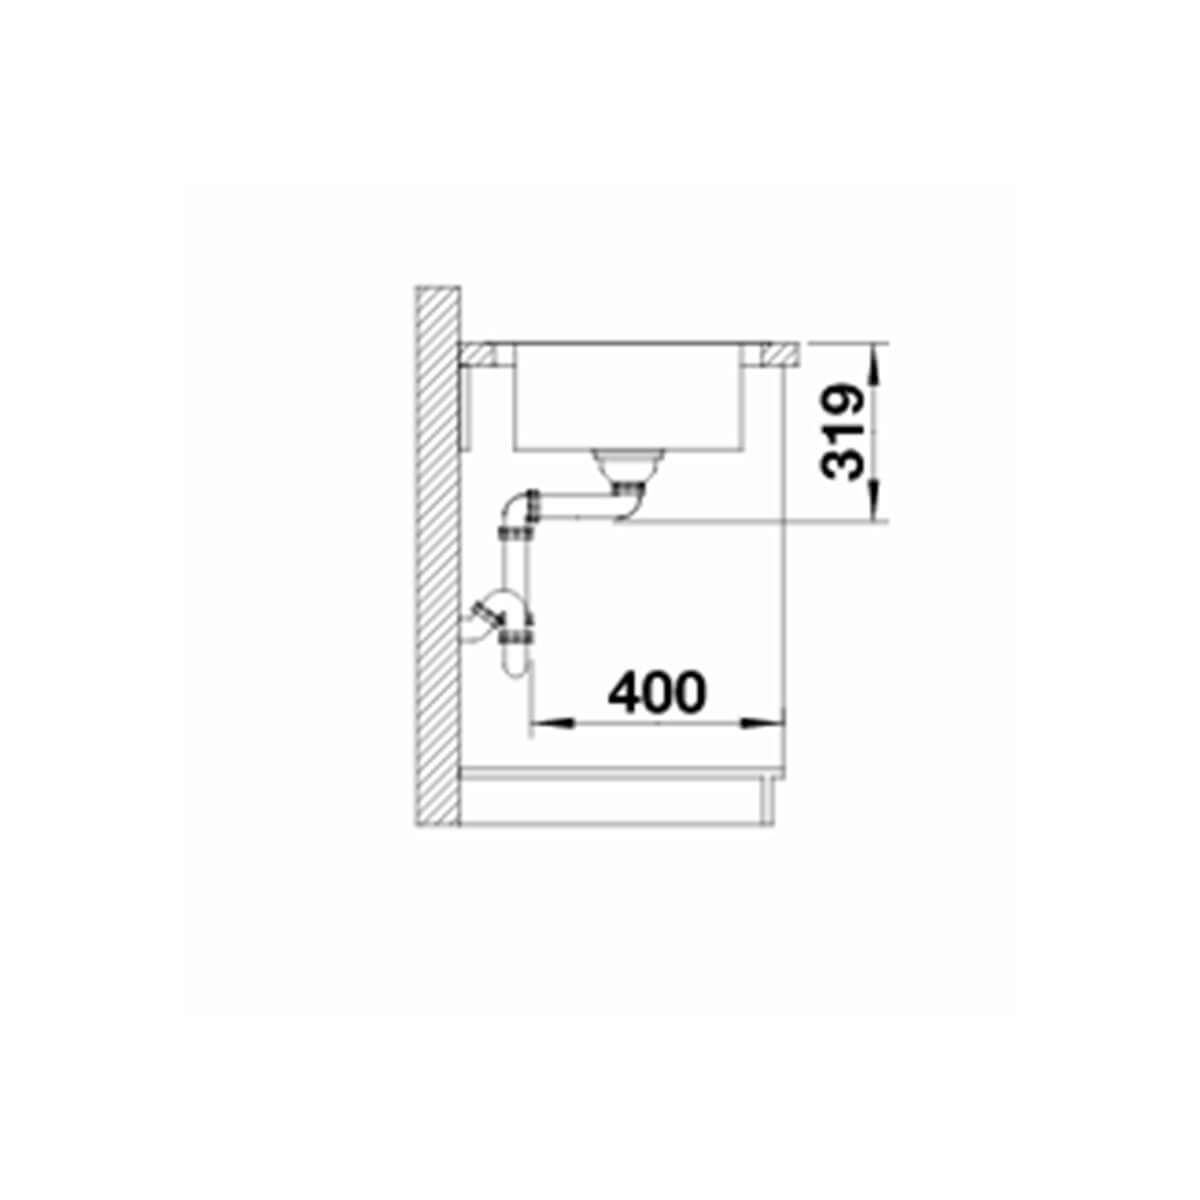 BLANCO ΑΝΟΞΕΙΔΩΤΟΣ ΝΕΡΟΧΥΤΗΣ ΕΝΘΕΤΟΣ MEDIAN XL 6 S-IF ΛΕΙΟΣ ΓΟΥΡΝΑ ΔΕΞΙΑ (100x50) 6